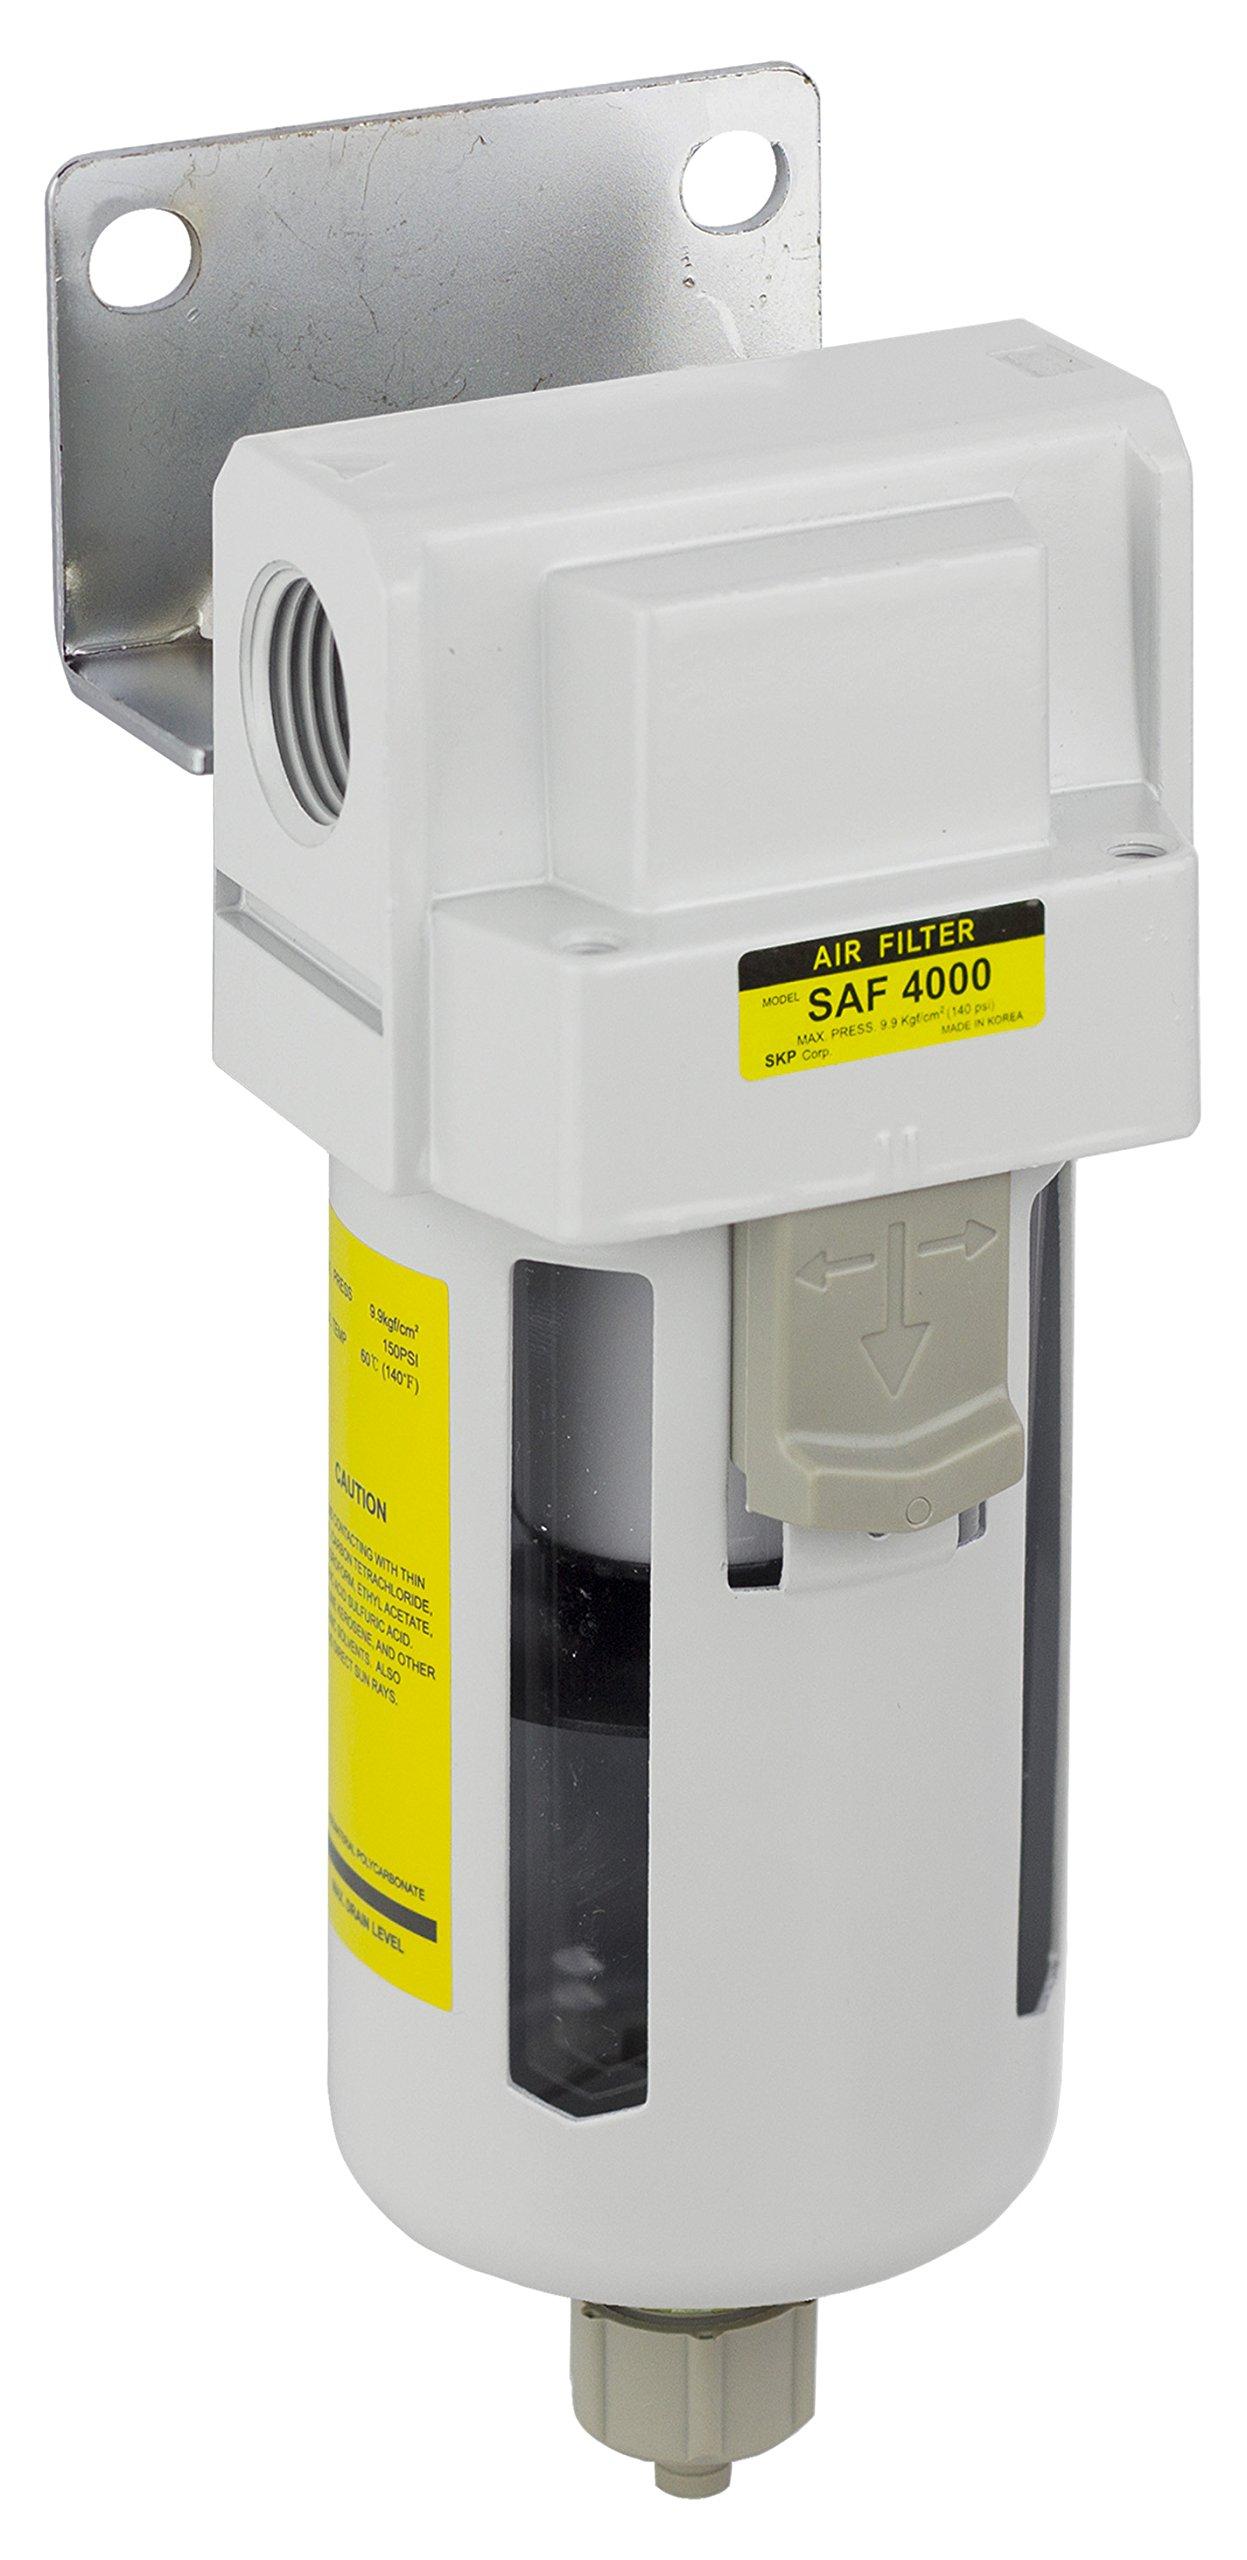 PneumaticPlus SAF4000M-N04B Compressed Air Particulate Filter, 1/2'' NPT, Manual Drain, Poly Bowl, 10 μm